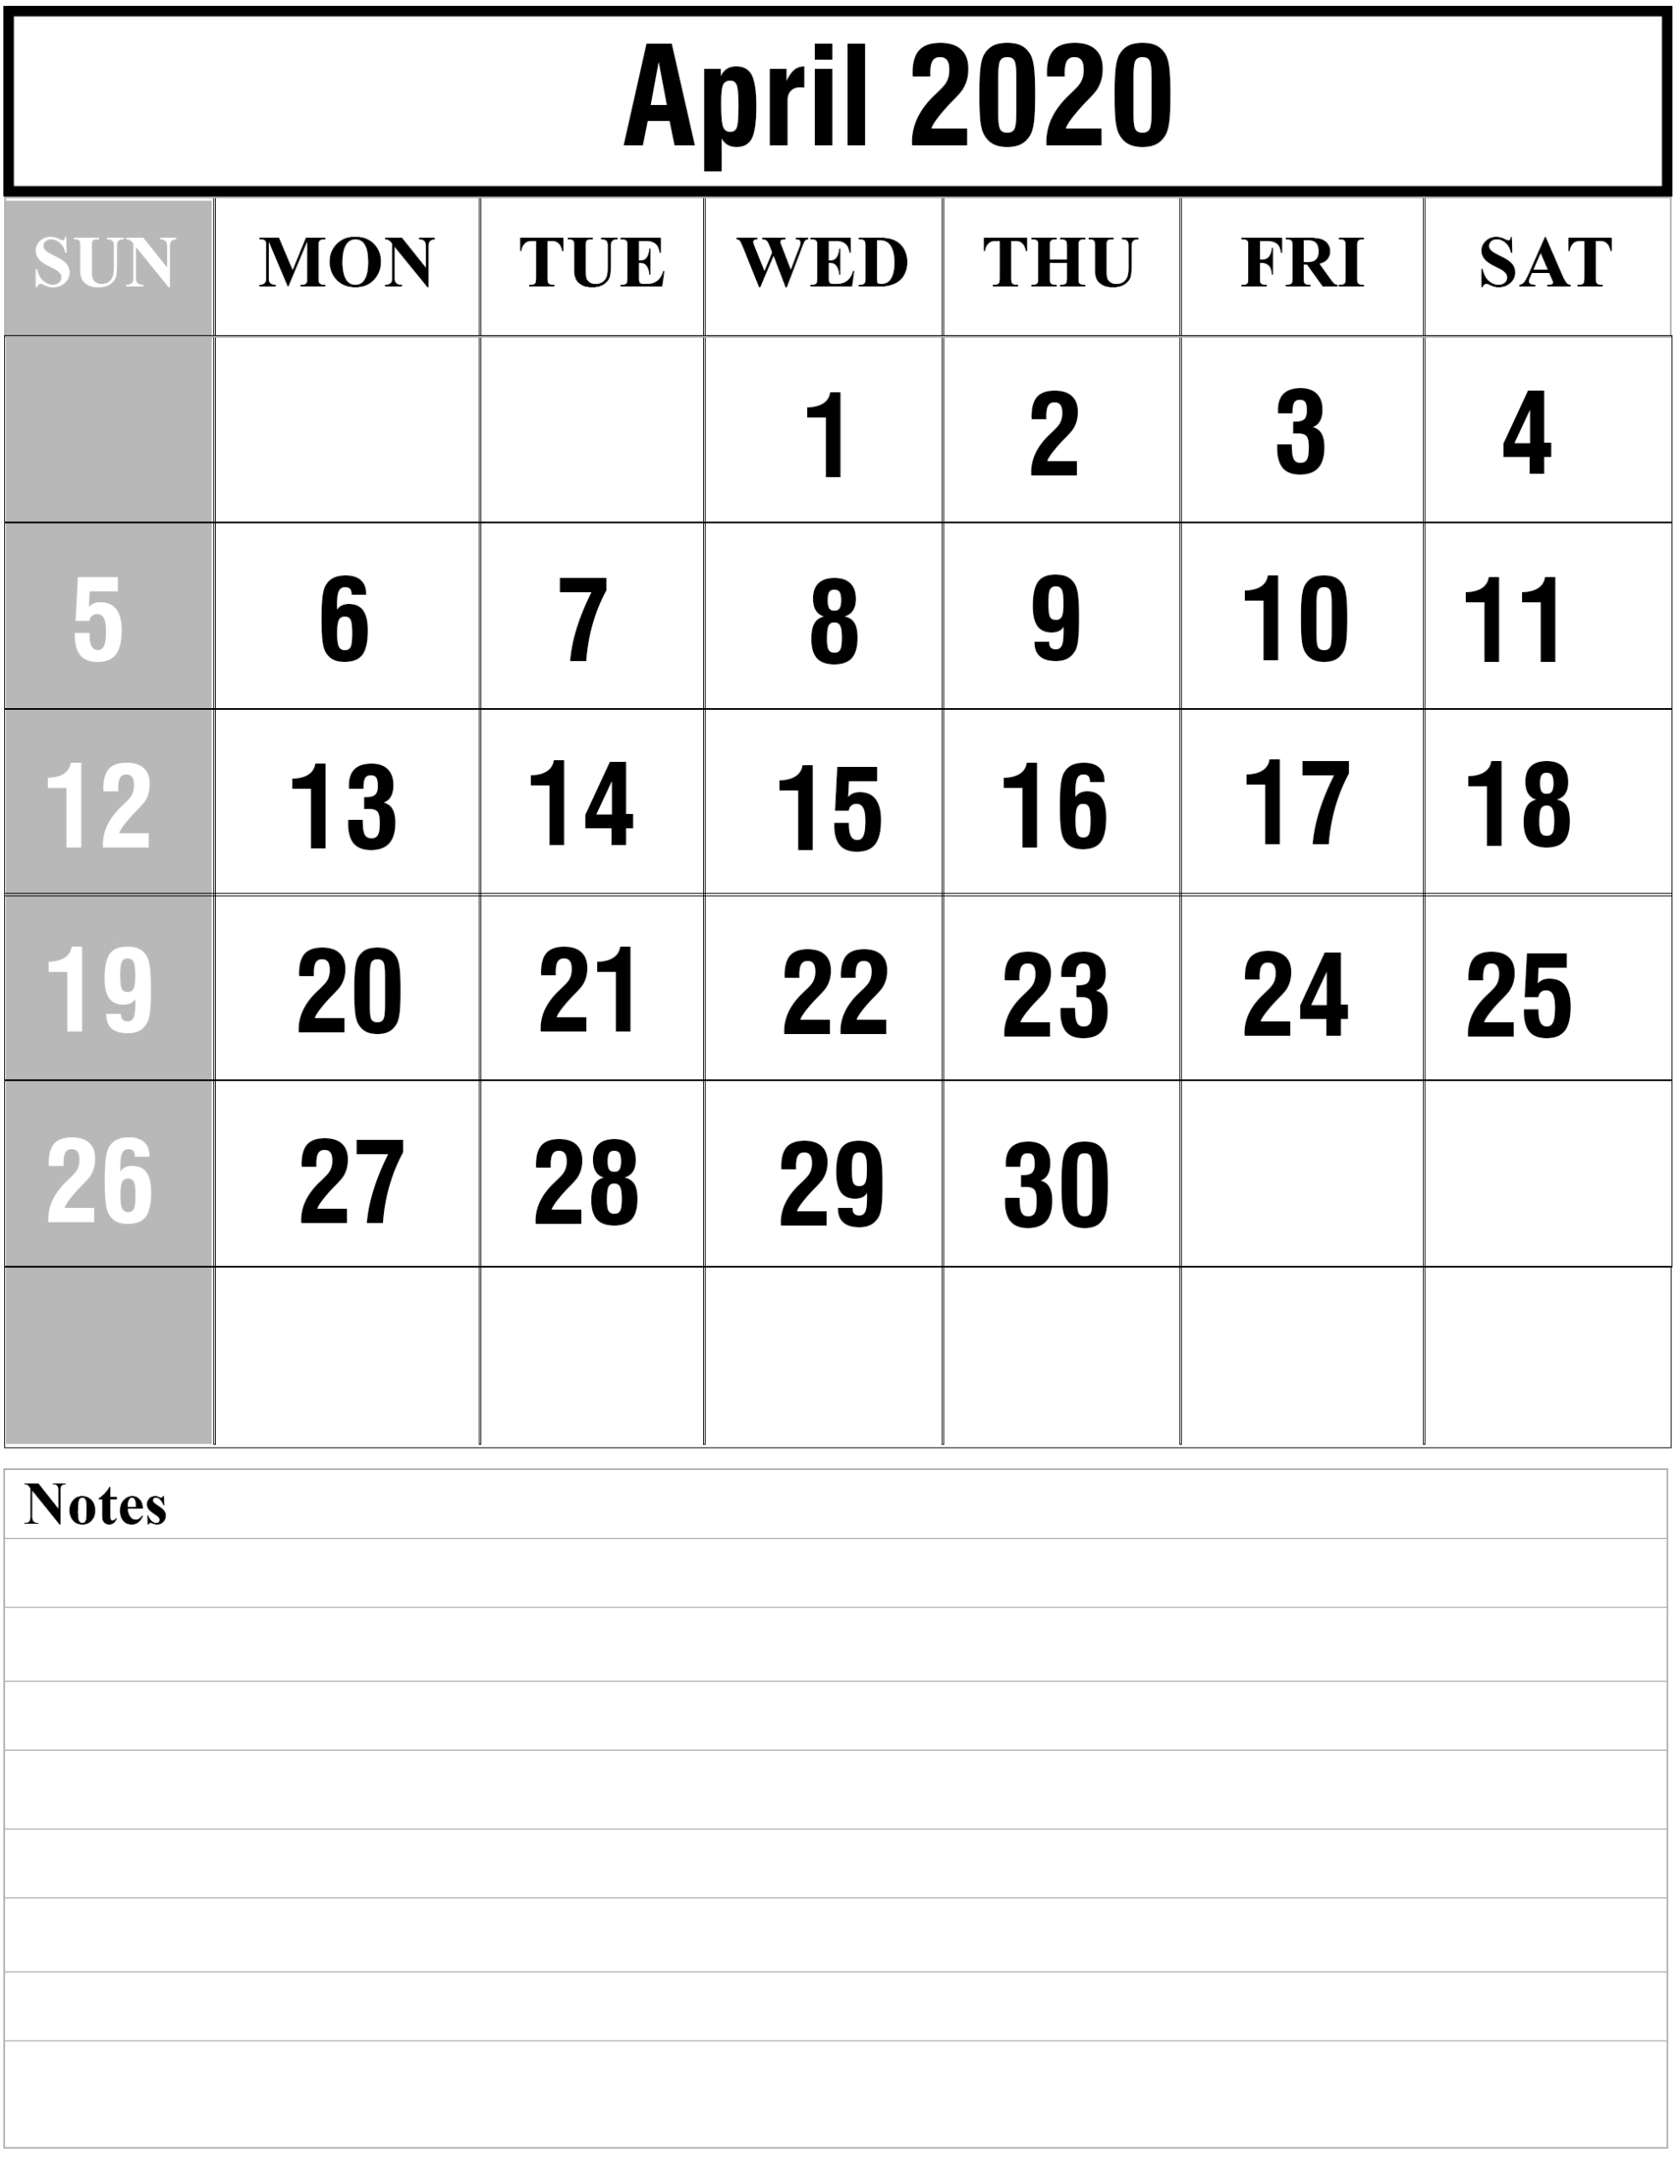 Free Blank April 2020 Printable Calendar [Pdf, Excel